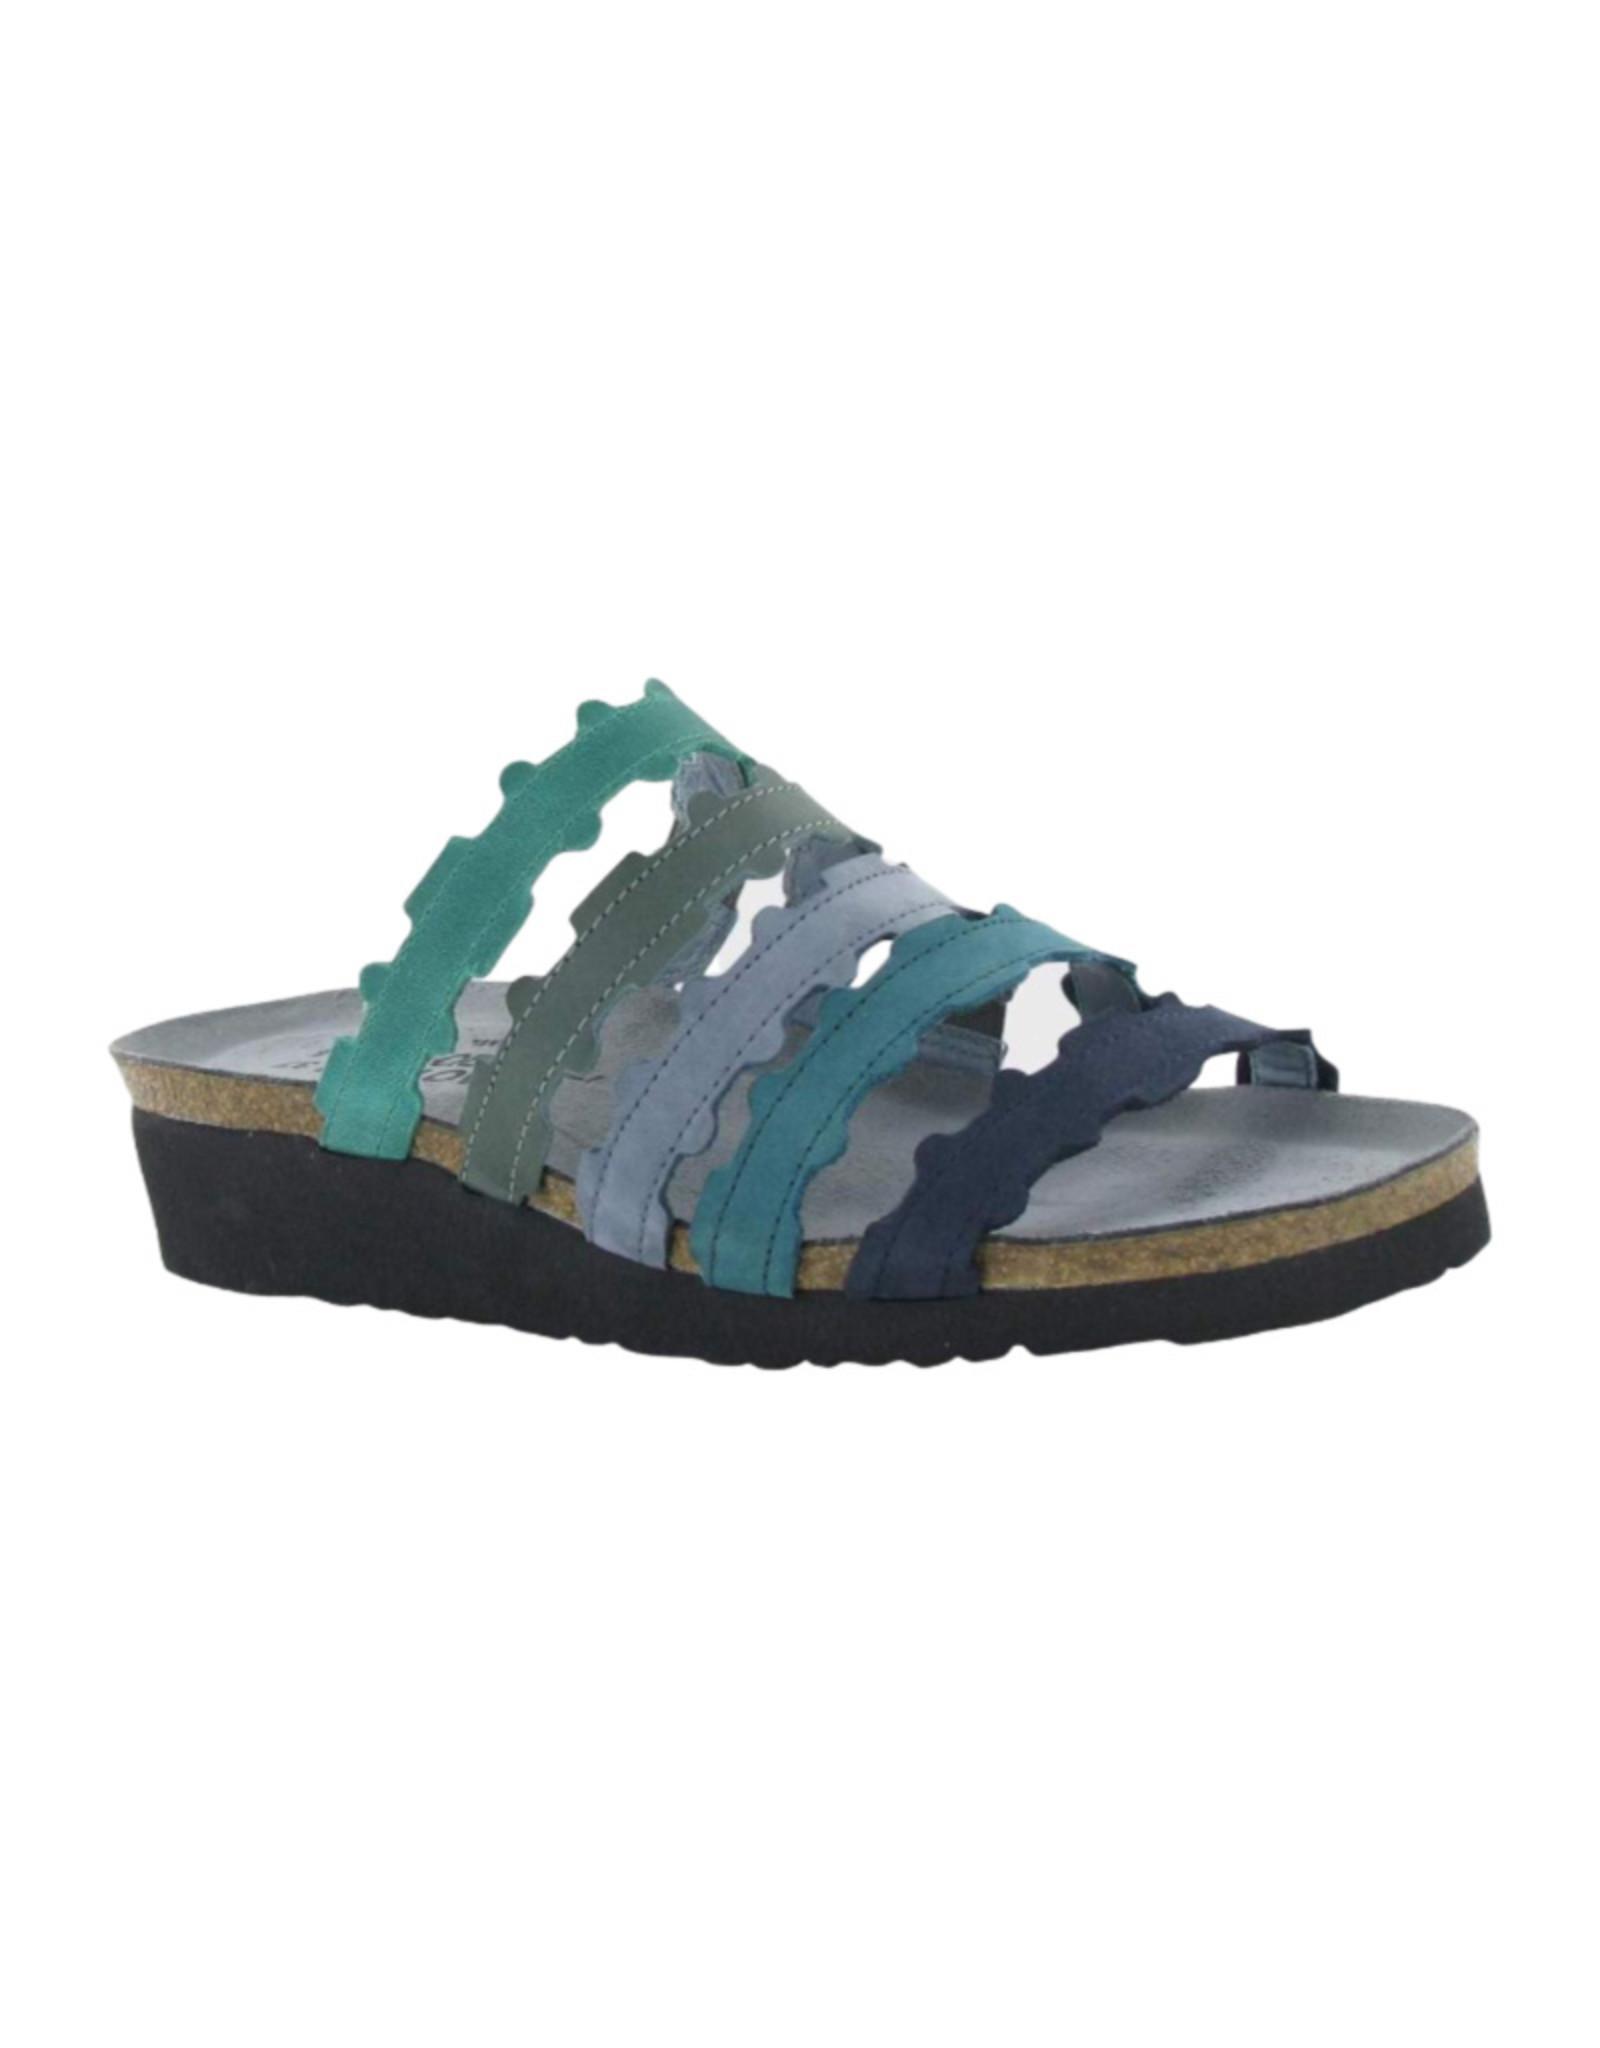 Naot Footwear Naot Adina Multi Strap Slide